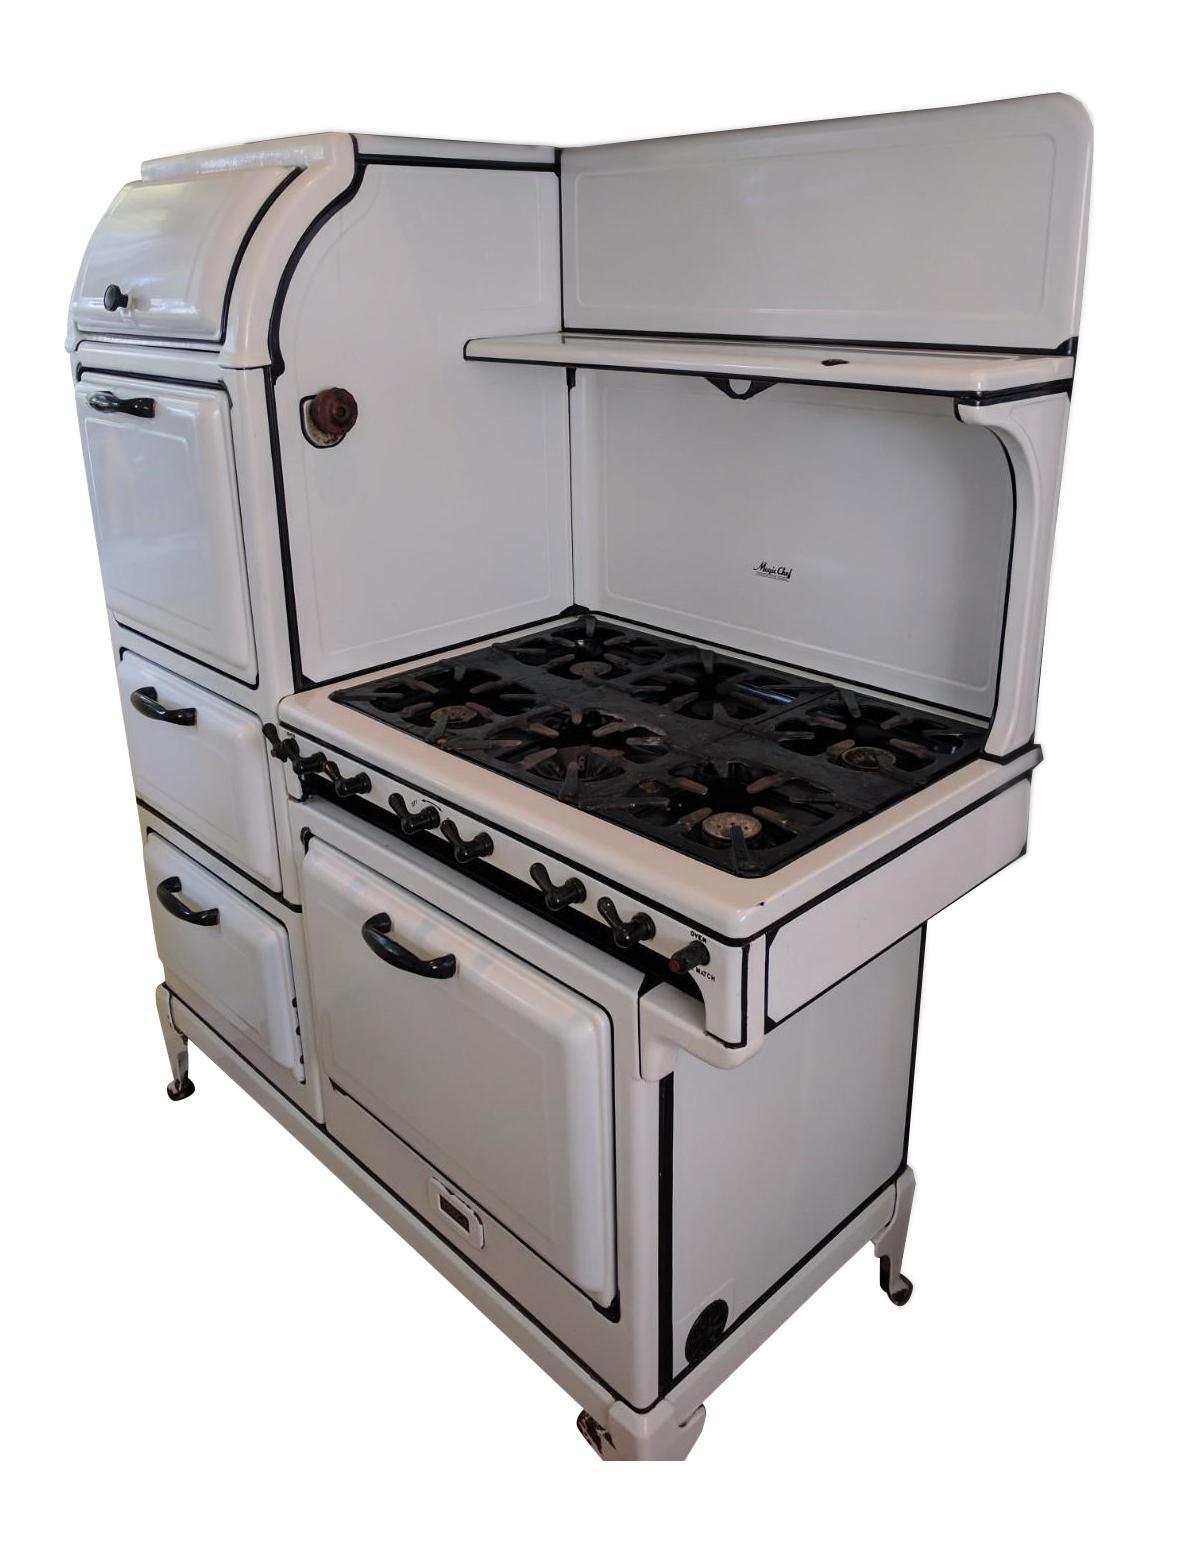 1930s magic chef series stove left stack